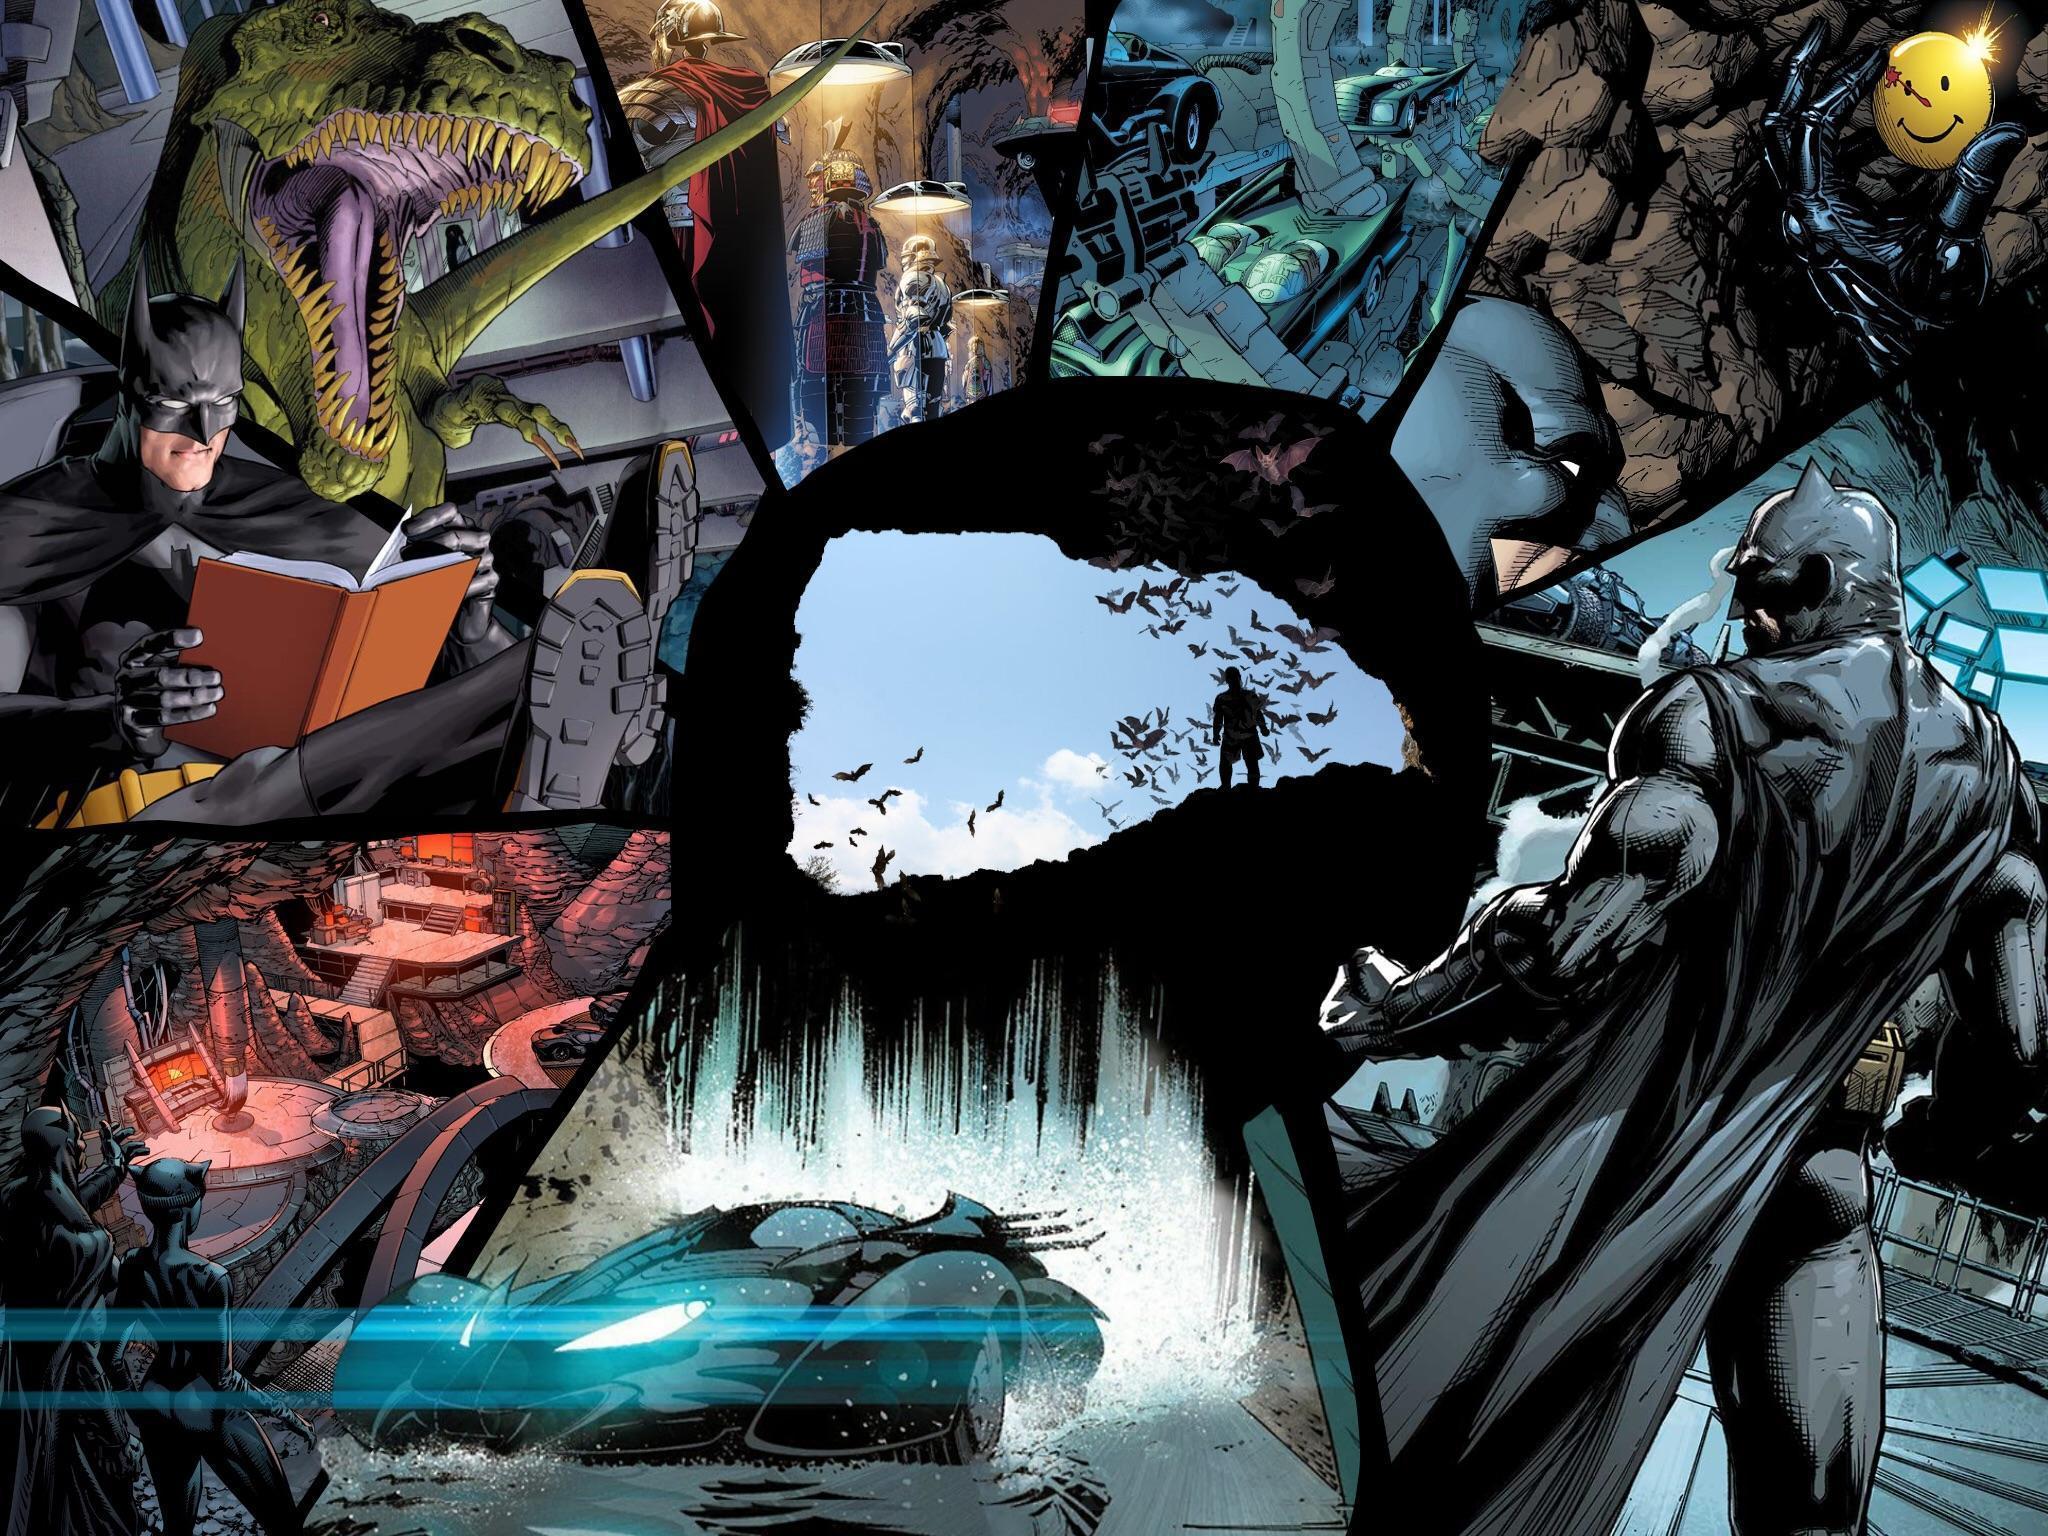 Inside The Batcave Wallpaper by me : batman